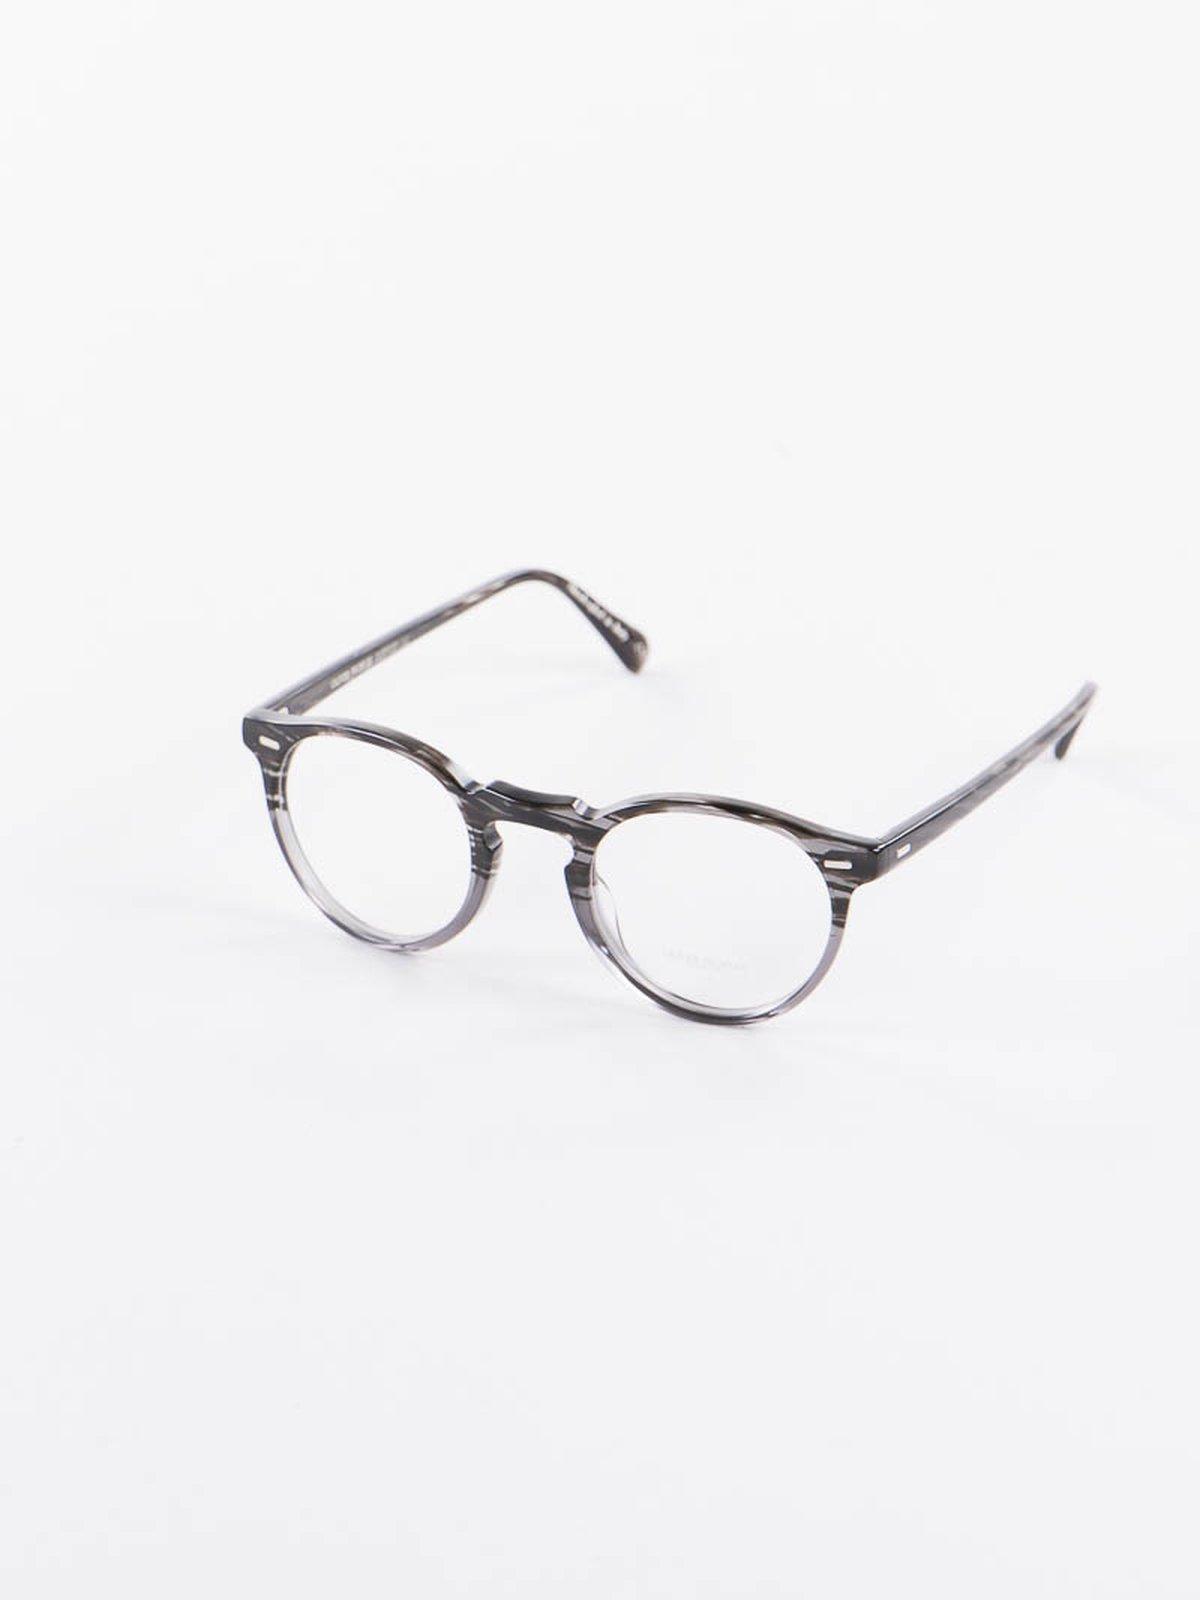 Storm Gregory Peck Optical Frame - Image 3